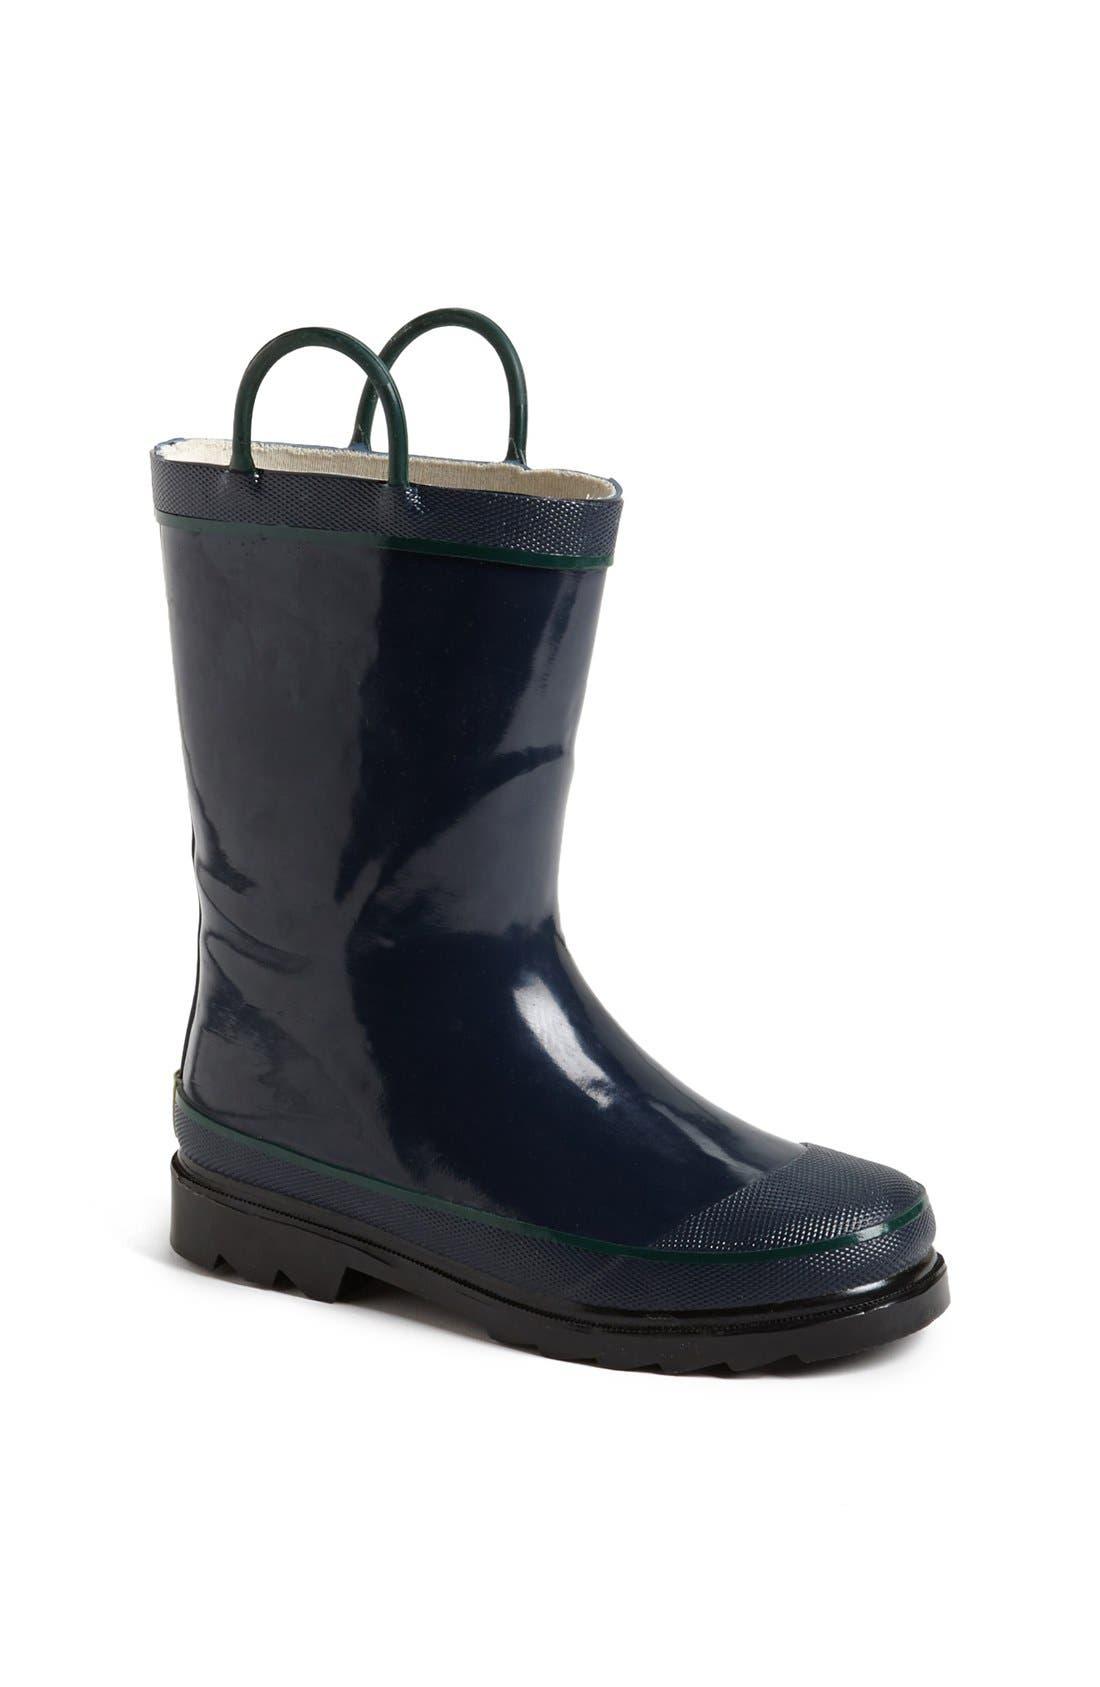 WESTERN CHIEF, Firechief 2 Waterproof Rain Boot, Main thumbnail 1, color, NAVY